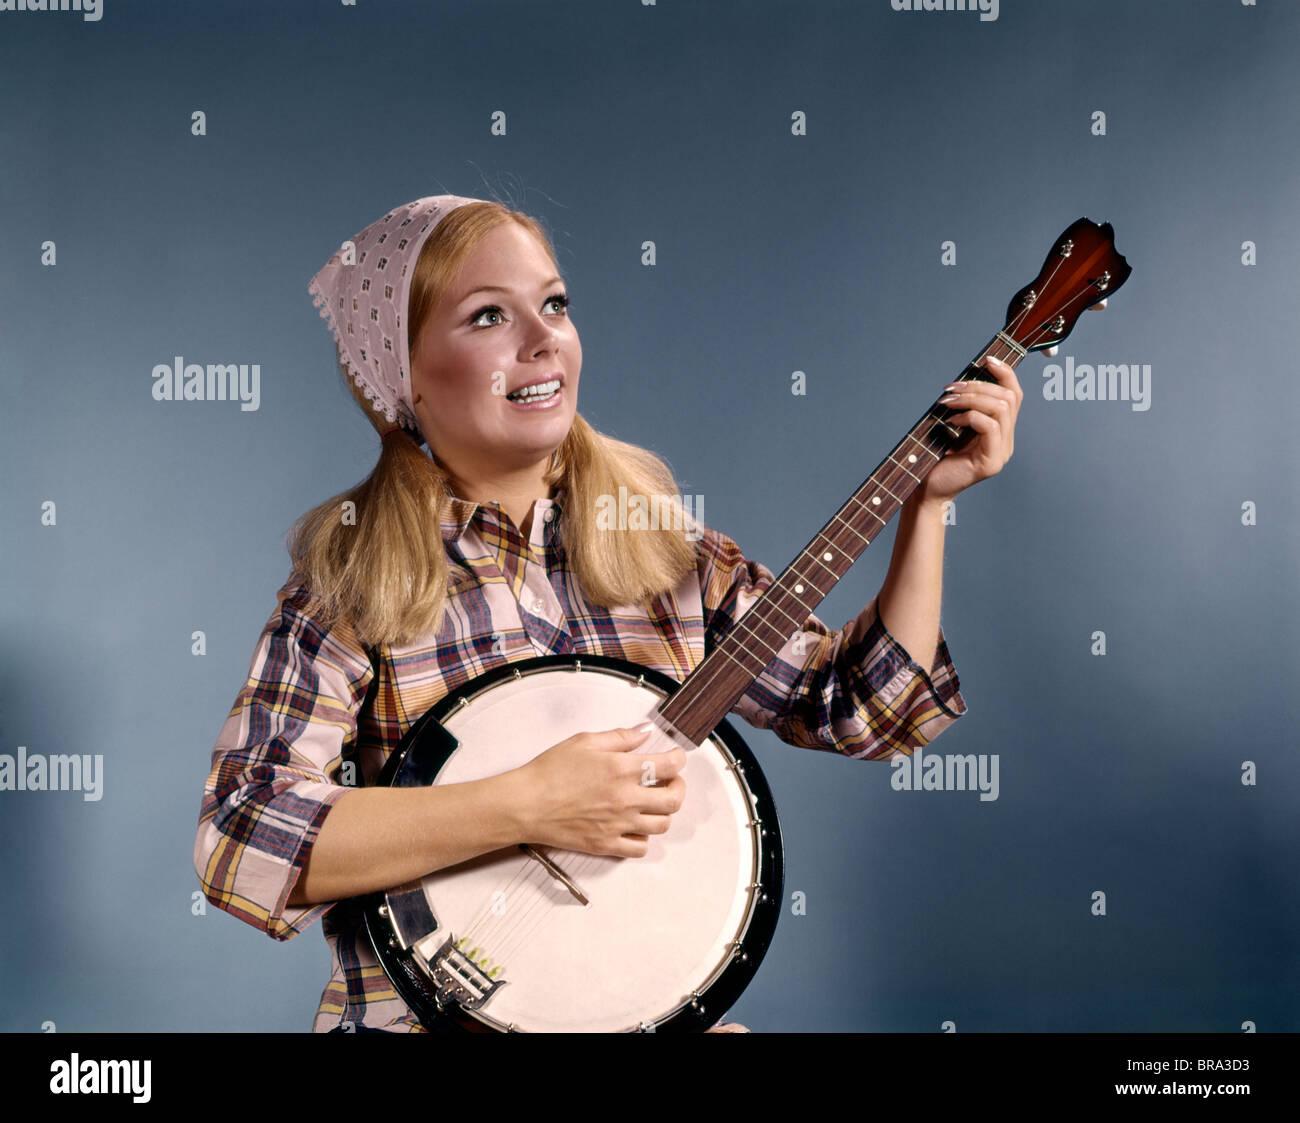 Amateur mature woman playing